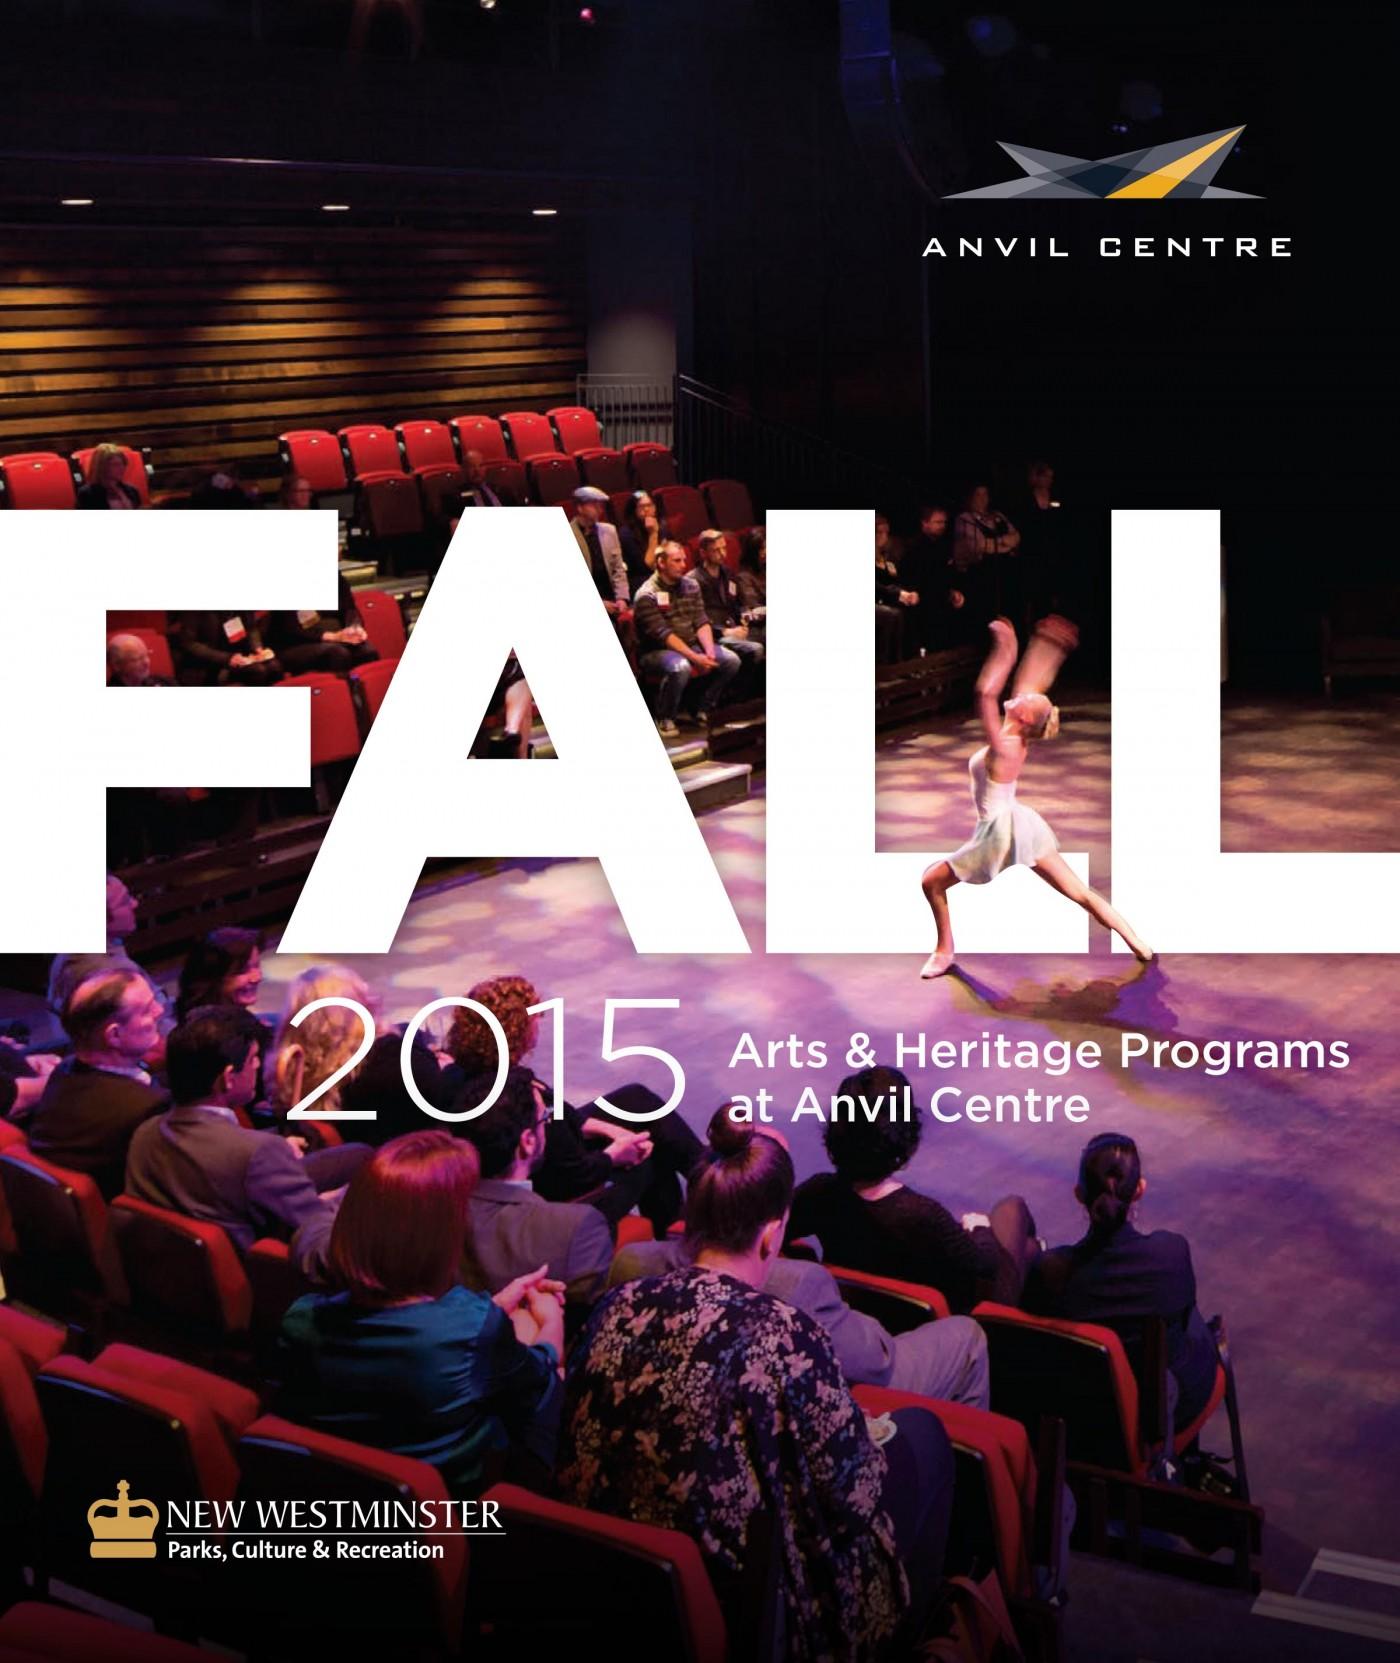 Anvil-Centre-Program-Guide-Fall-2015-5-1